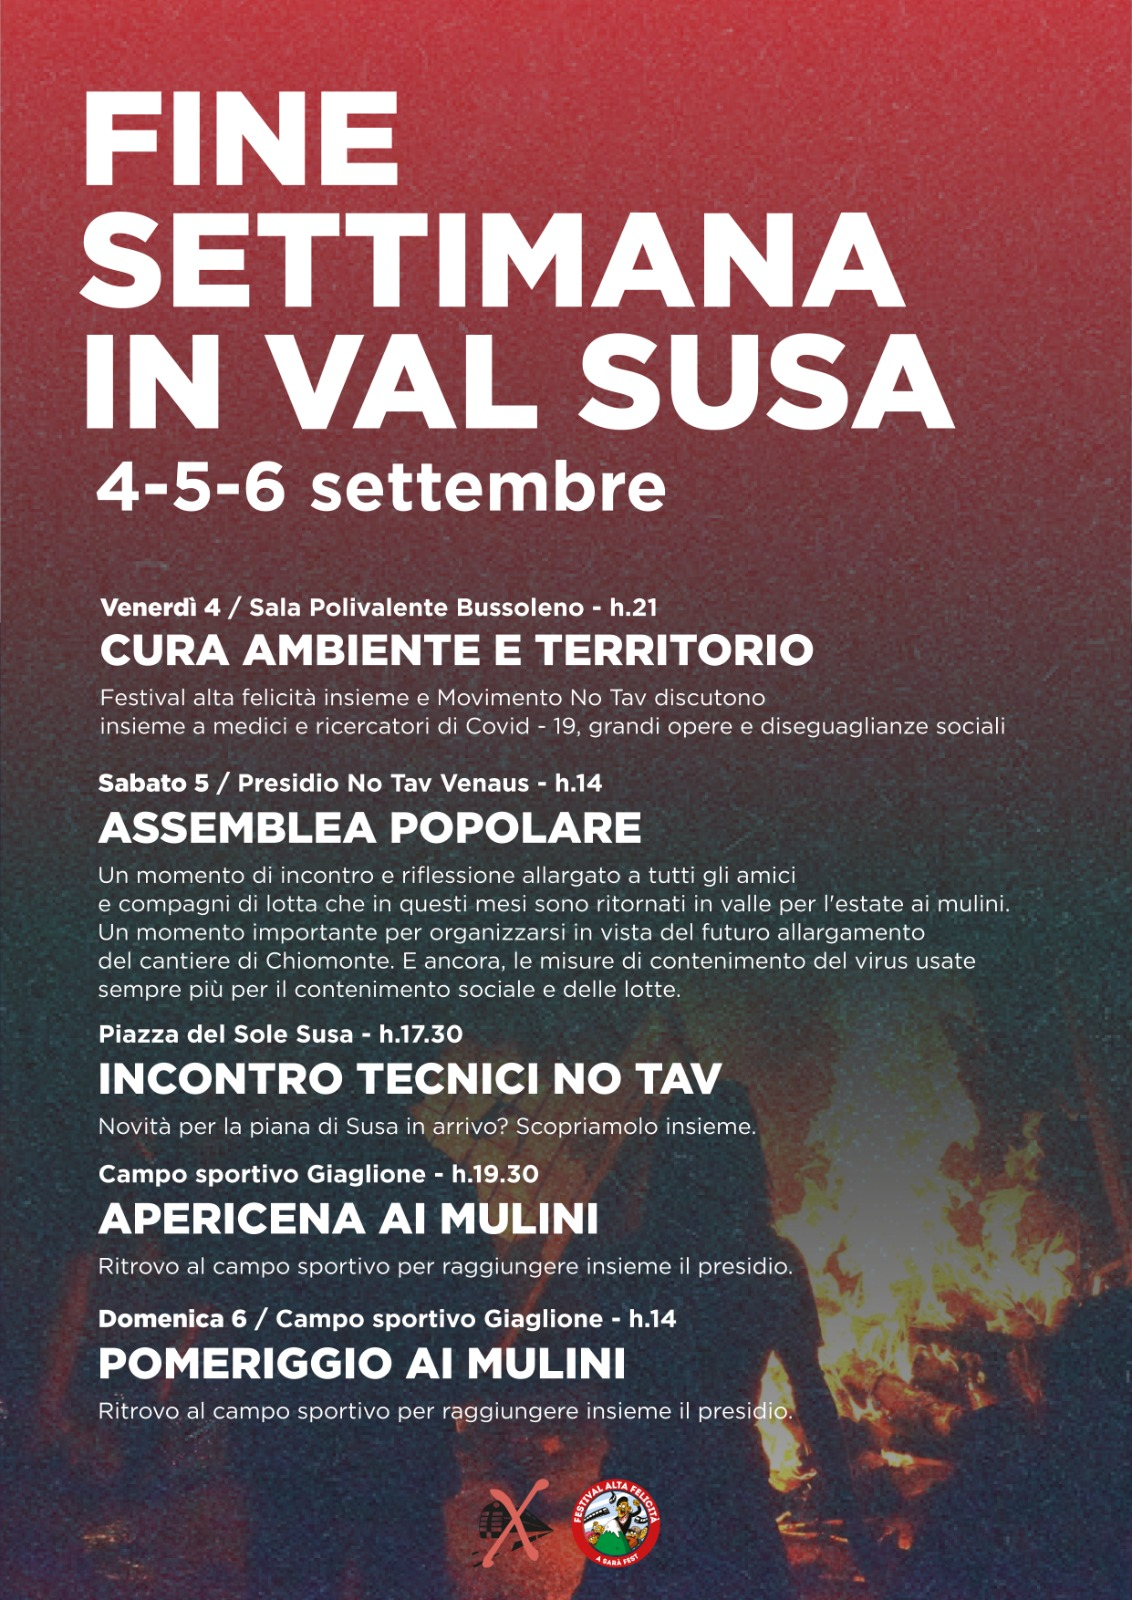 4-5-6/09. Fine settimana in Valsusa!